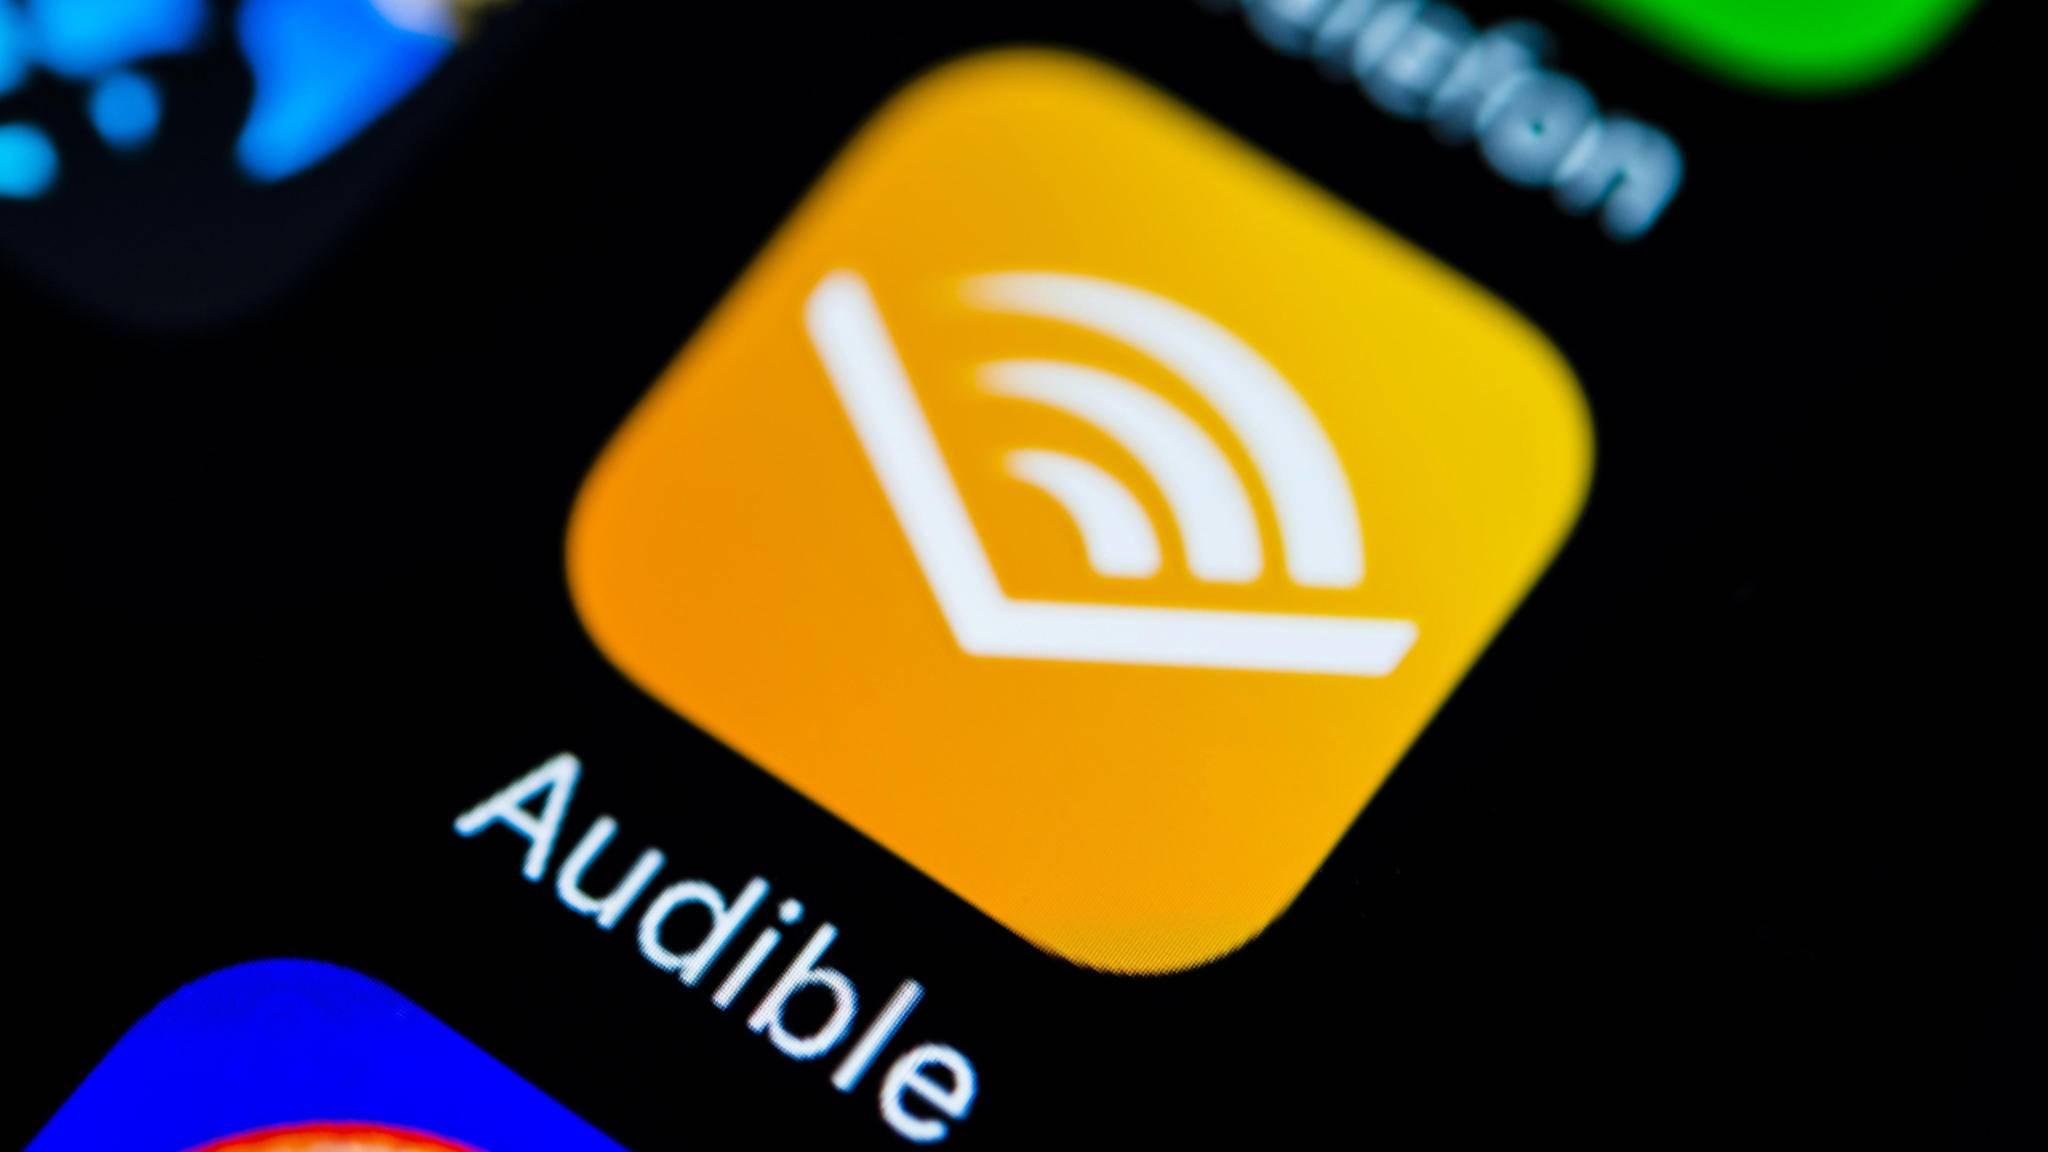 Amazon lässt Dich Audible nur 30 Tage lang kostenlos testen.